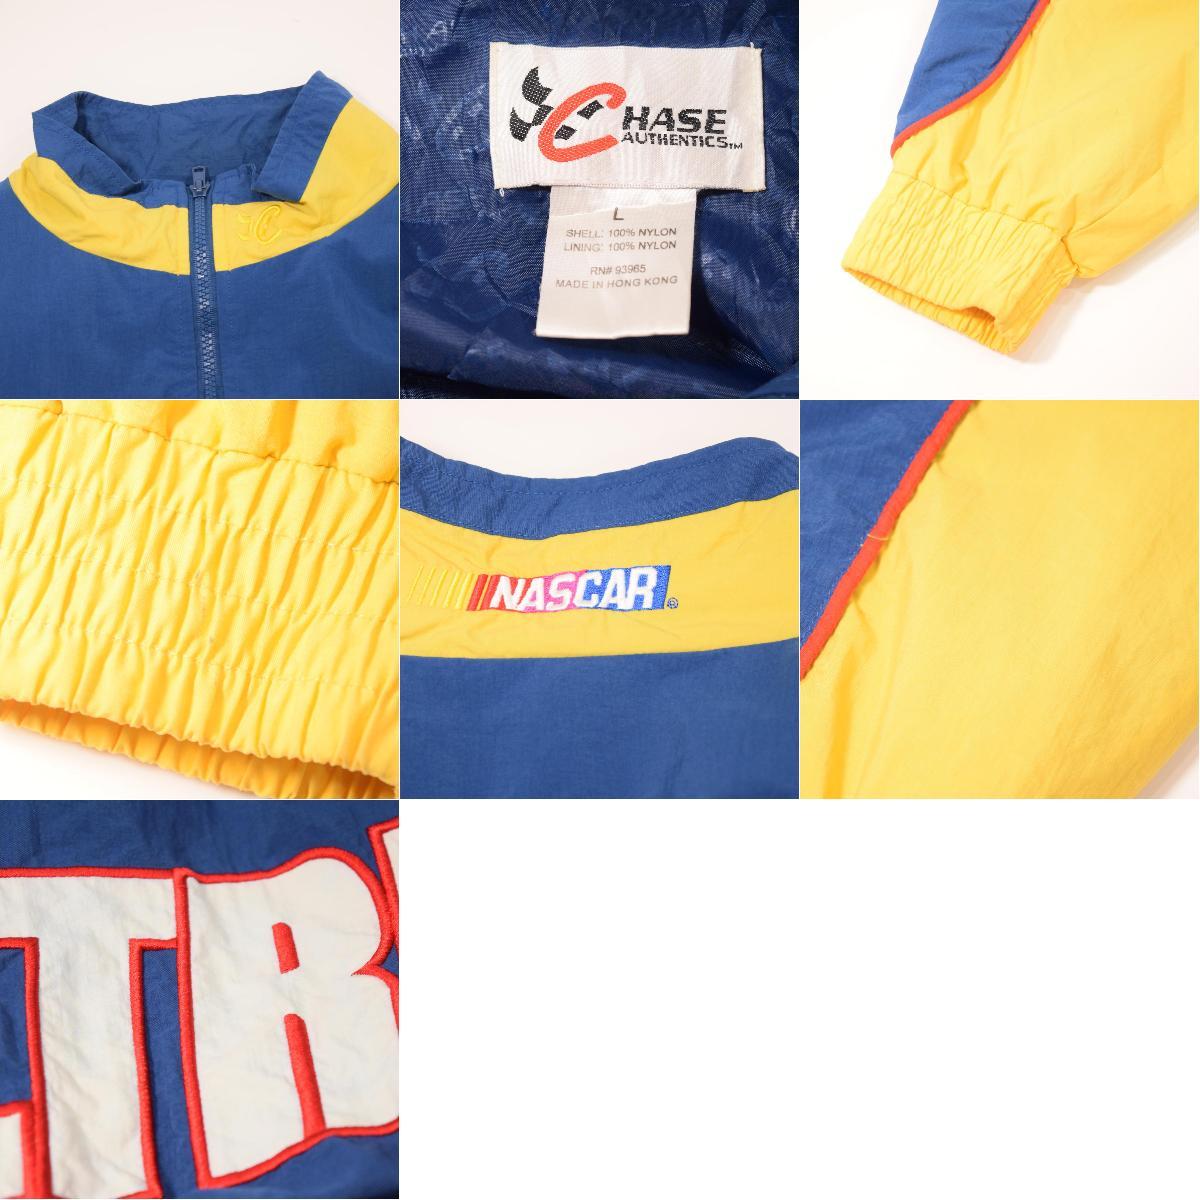 CHASE AUTHENTICS NASCAR NASCAR MICHAEL WALTRIP Michael Walt lip nylon  racing jacket men XL /wax3365